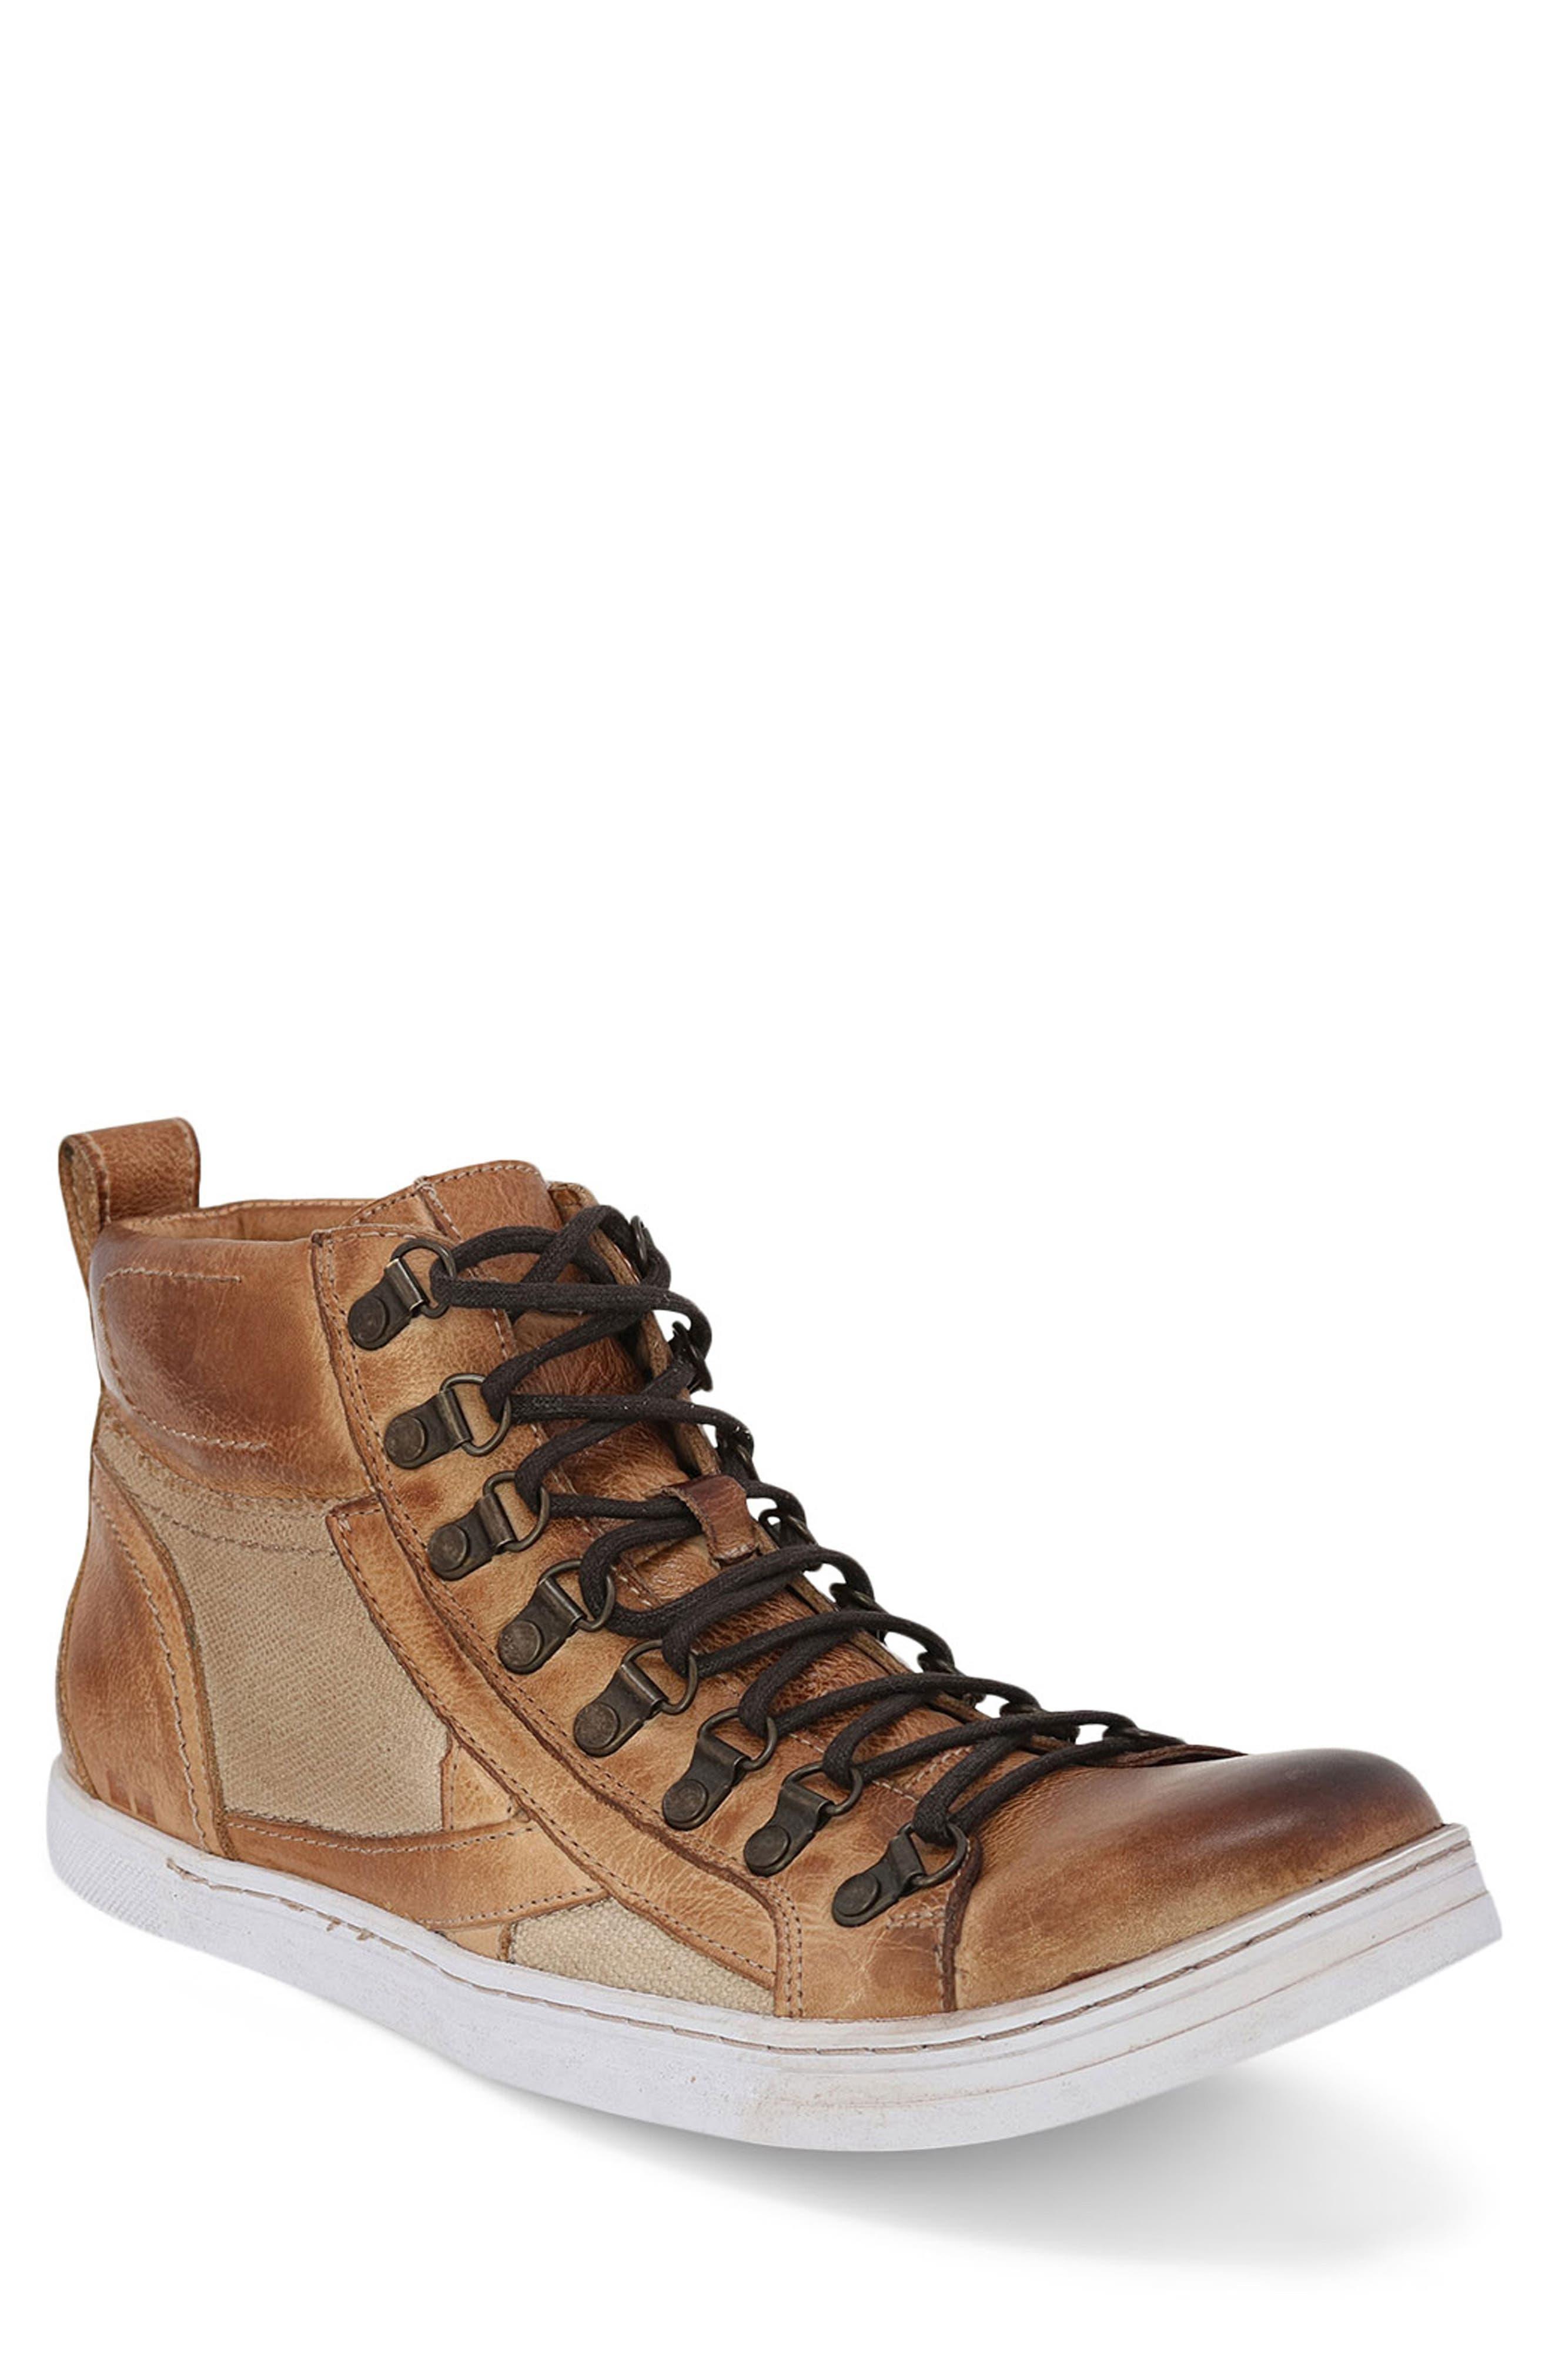 Brentwood Sneaker